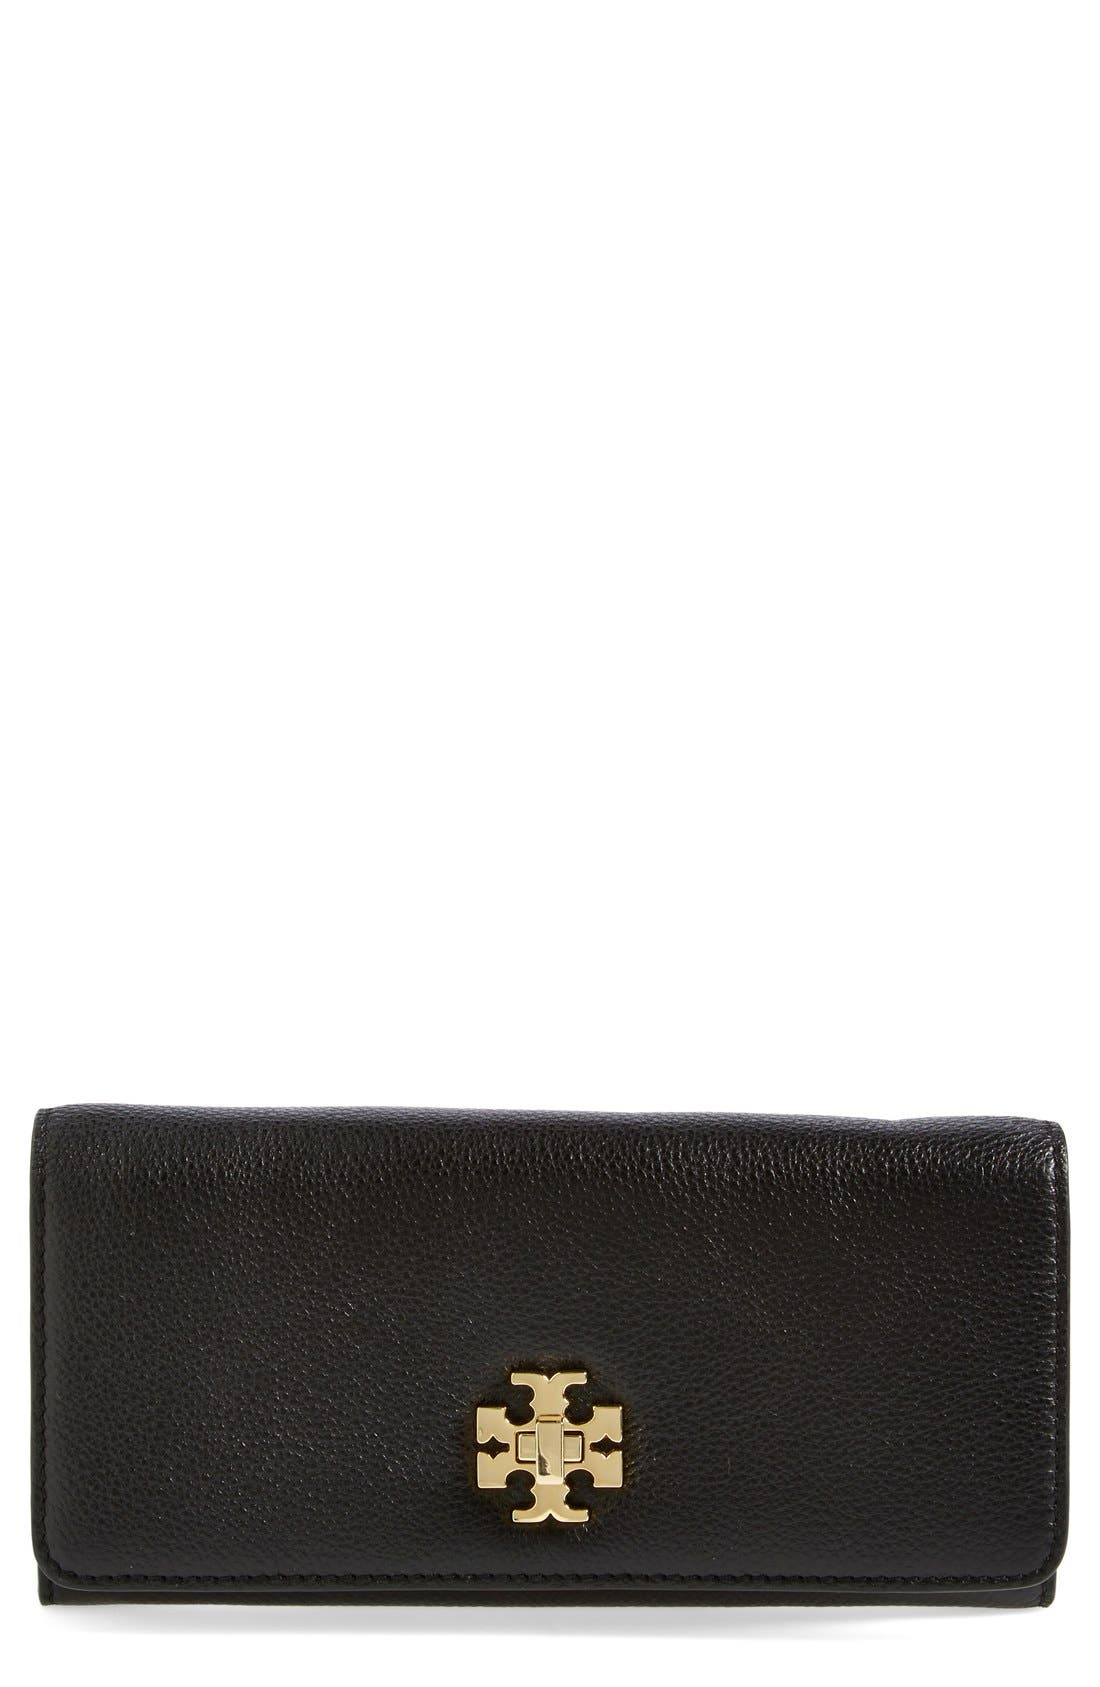 Main Image - Tory Burch 'Mercer' Leather Envelope Wallet